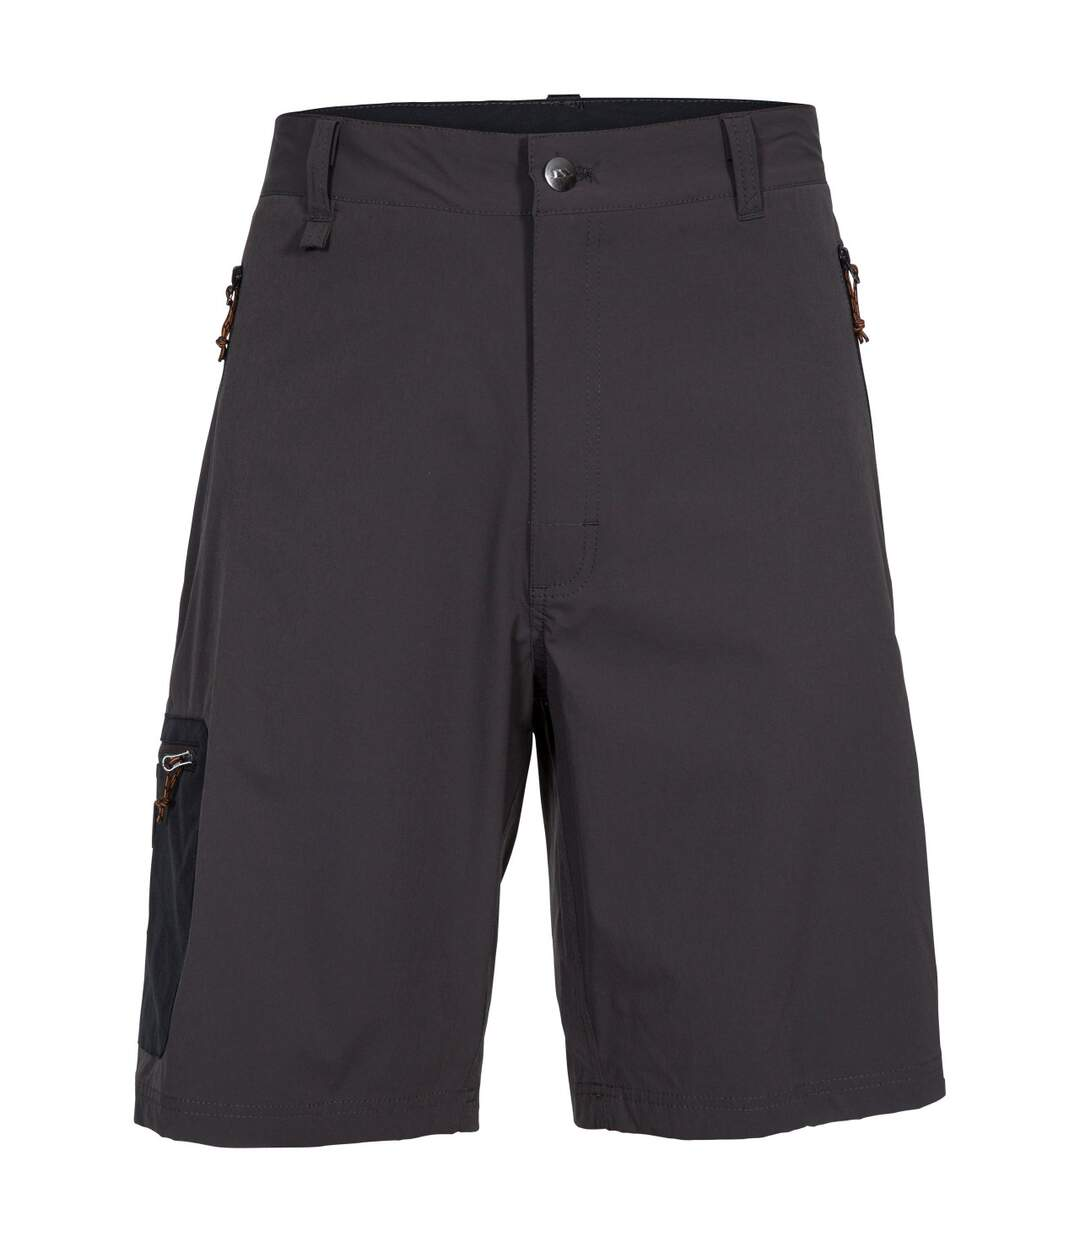 Trespass Mens Runnel Hiking Shorts (Peat) - UTTP4141